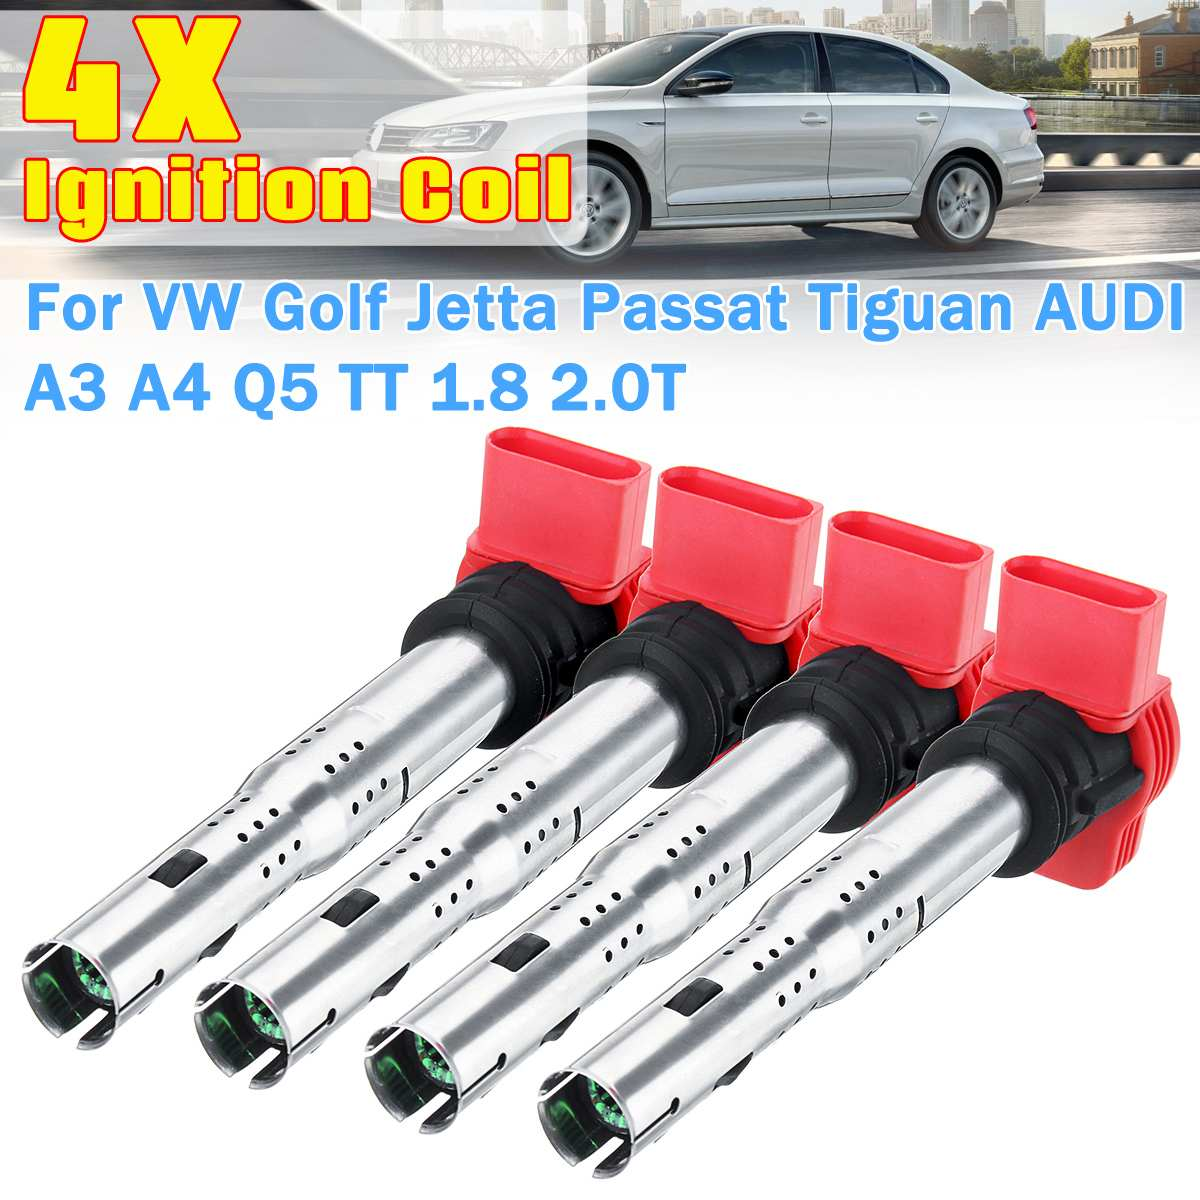 4 sztuk 06E905115A/B/C/D/E uniwersalna cewka zapłonowa dla VW dla golfa dla Jetta dla passata dla Tiguan dla AUDI A3 A4 Q5 TT 1.8 2.0T